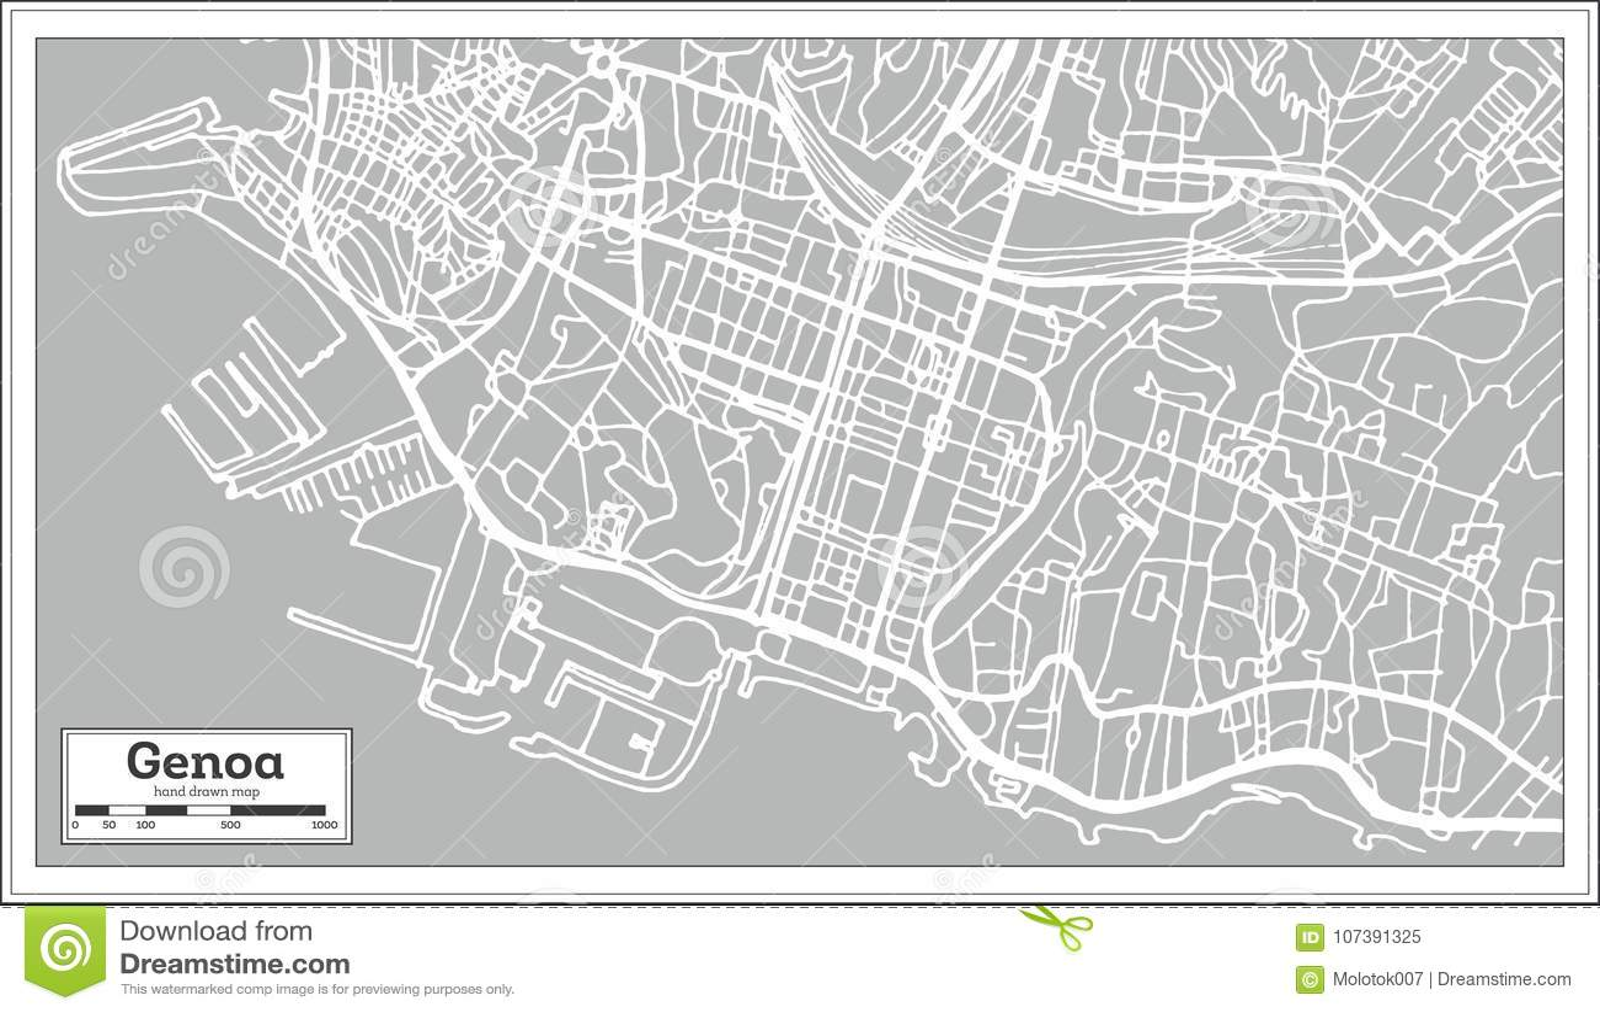 Genoa italy city map in retro style stock vector illustration of genoa italy city map in retro style altavistaventures Choice Image